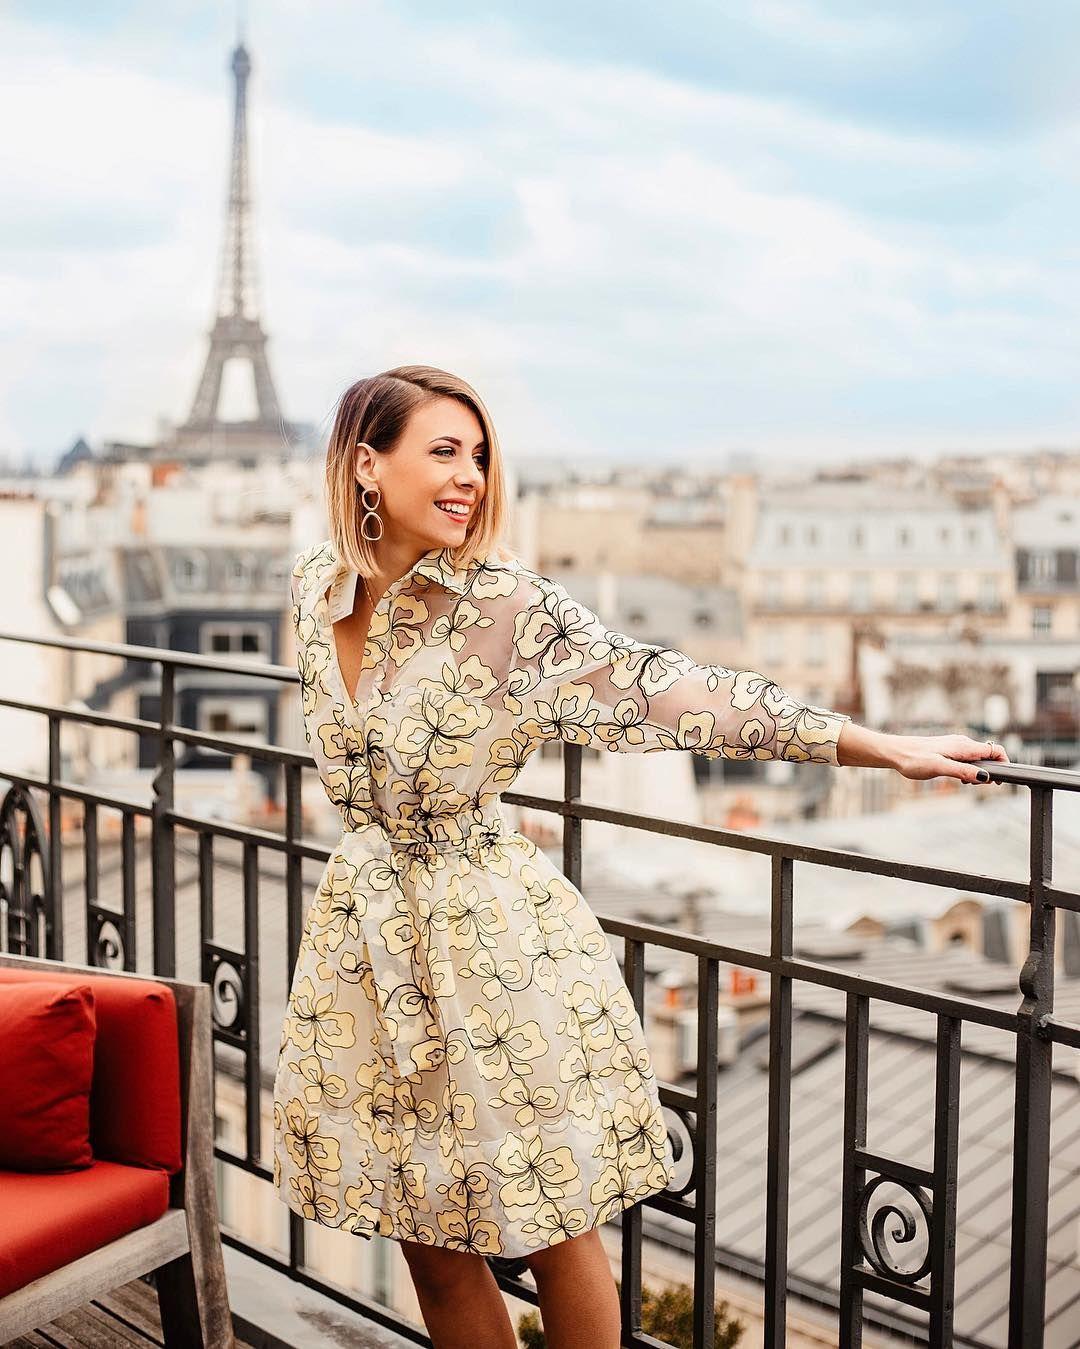 La jolie Sabrina Cesari porte la robe Reality parfaite pour